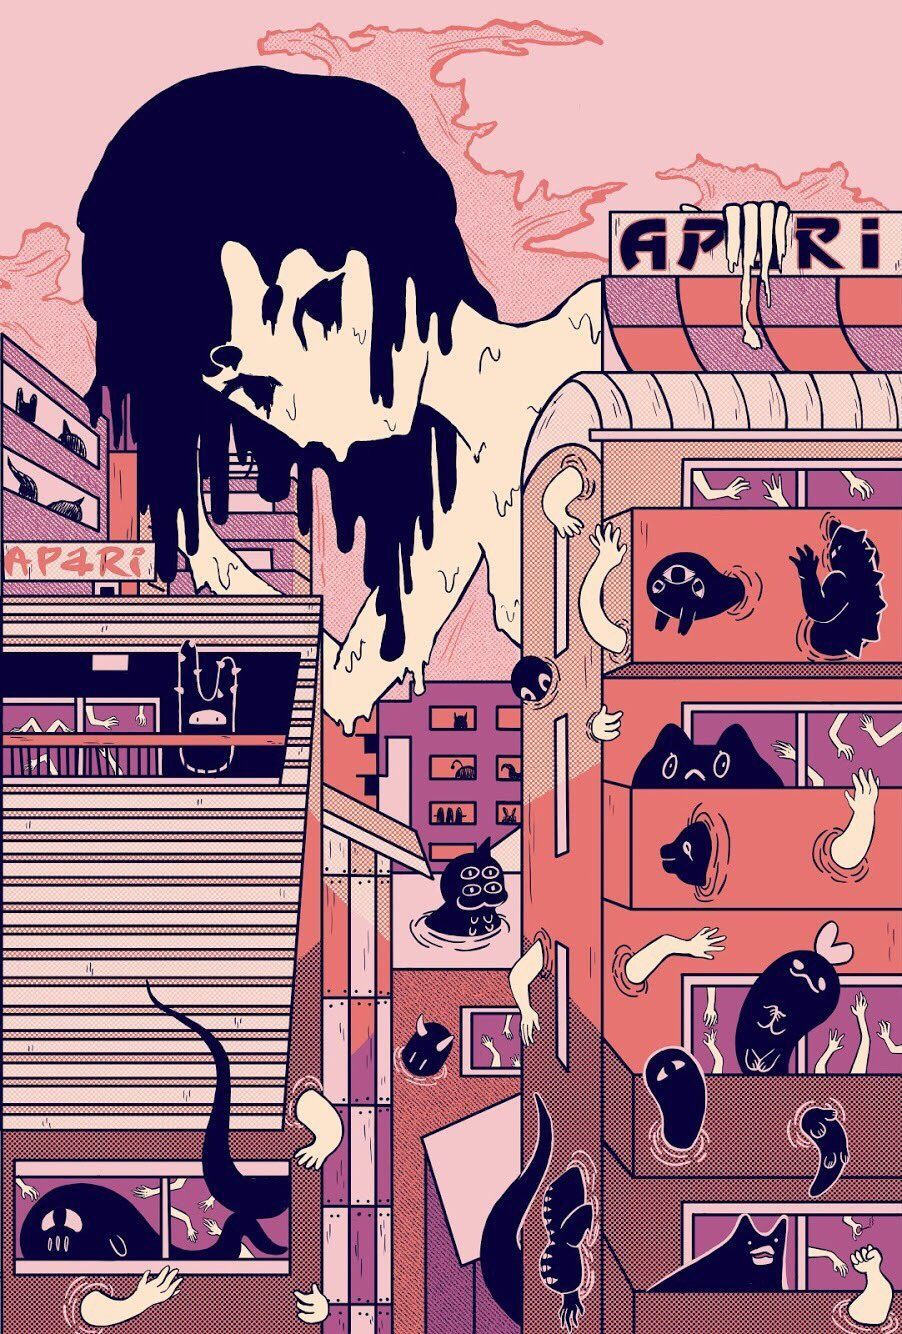 Retro Anime Wallpapers Top Free Retro Anime Backgrounds